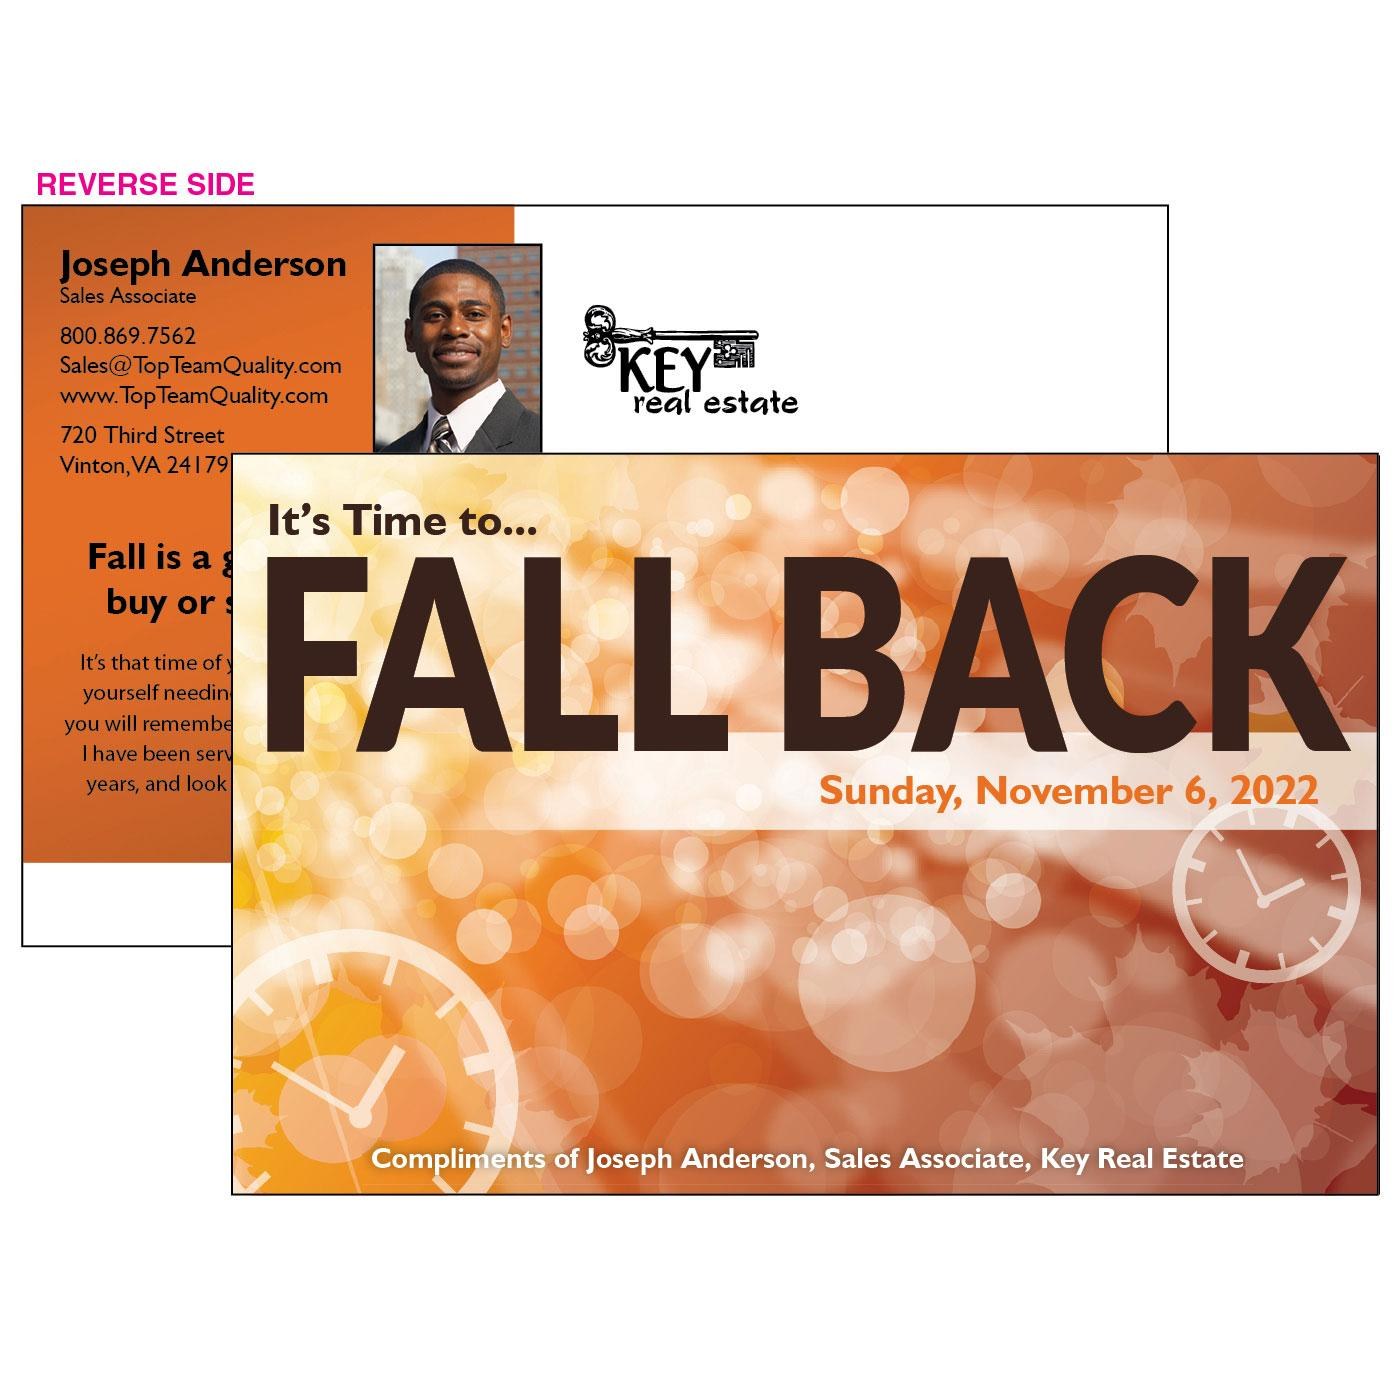 2019 Fall Back Jumbo Postcard